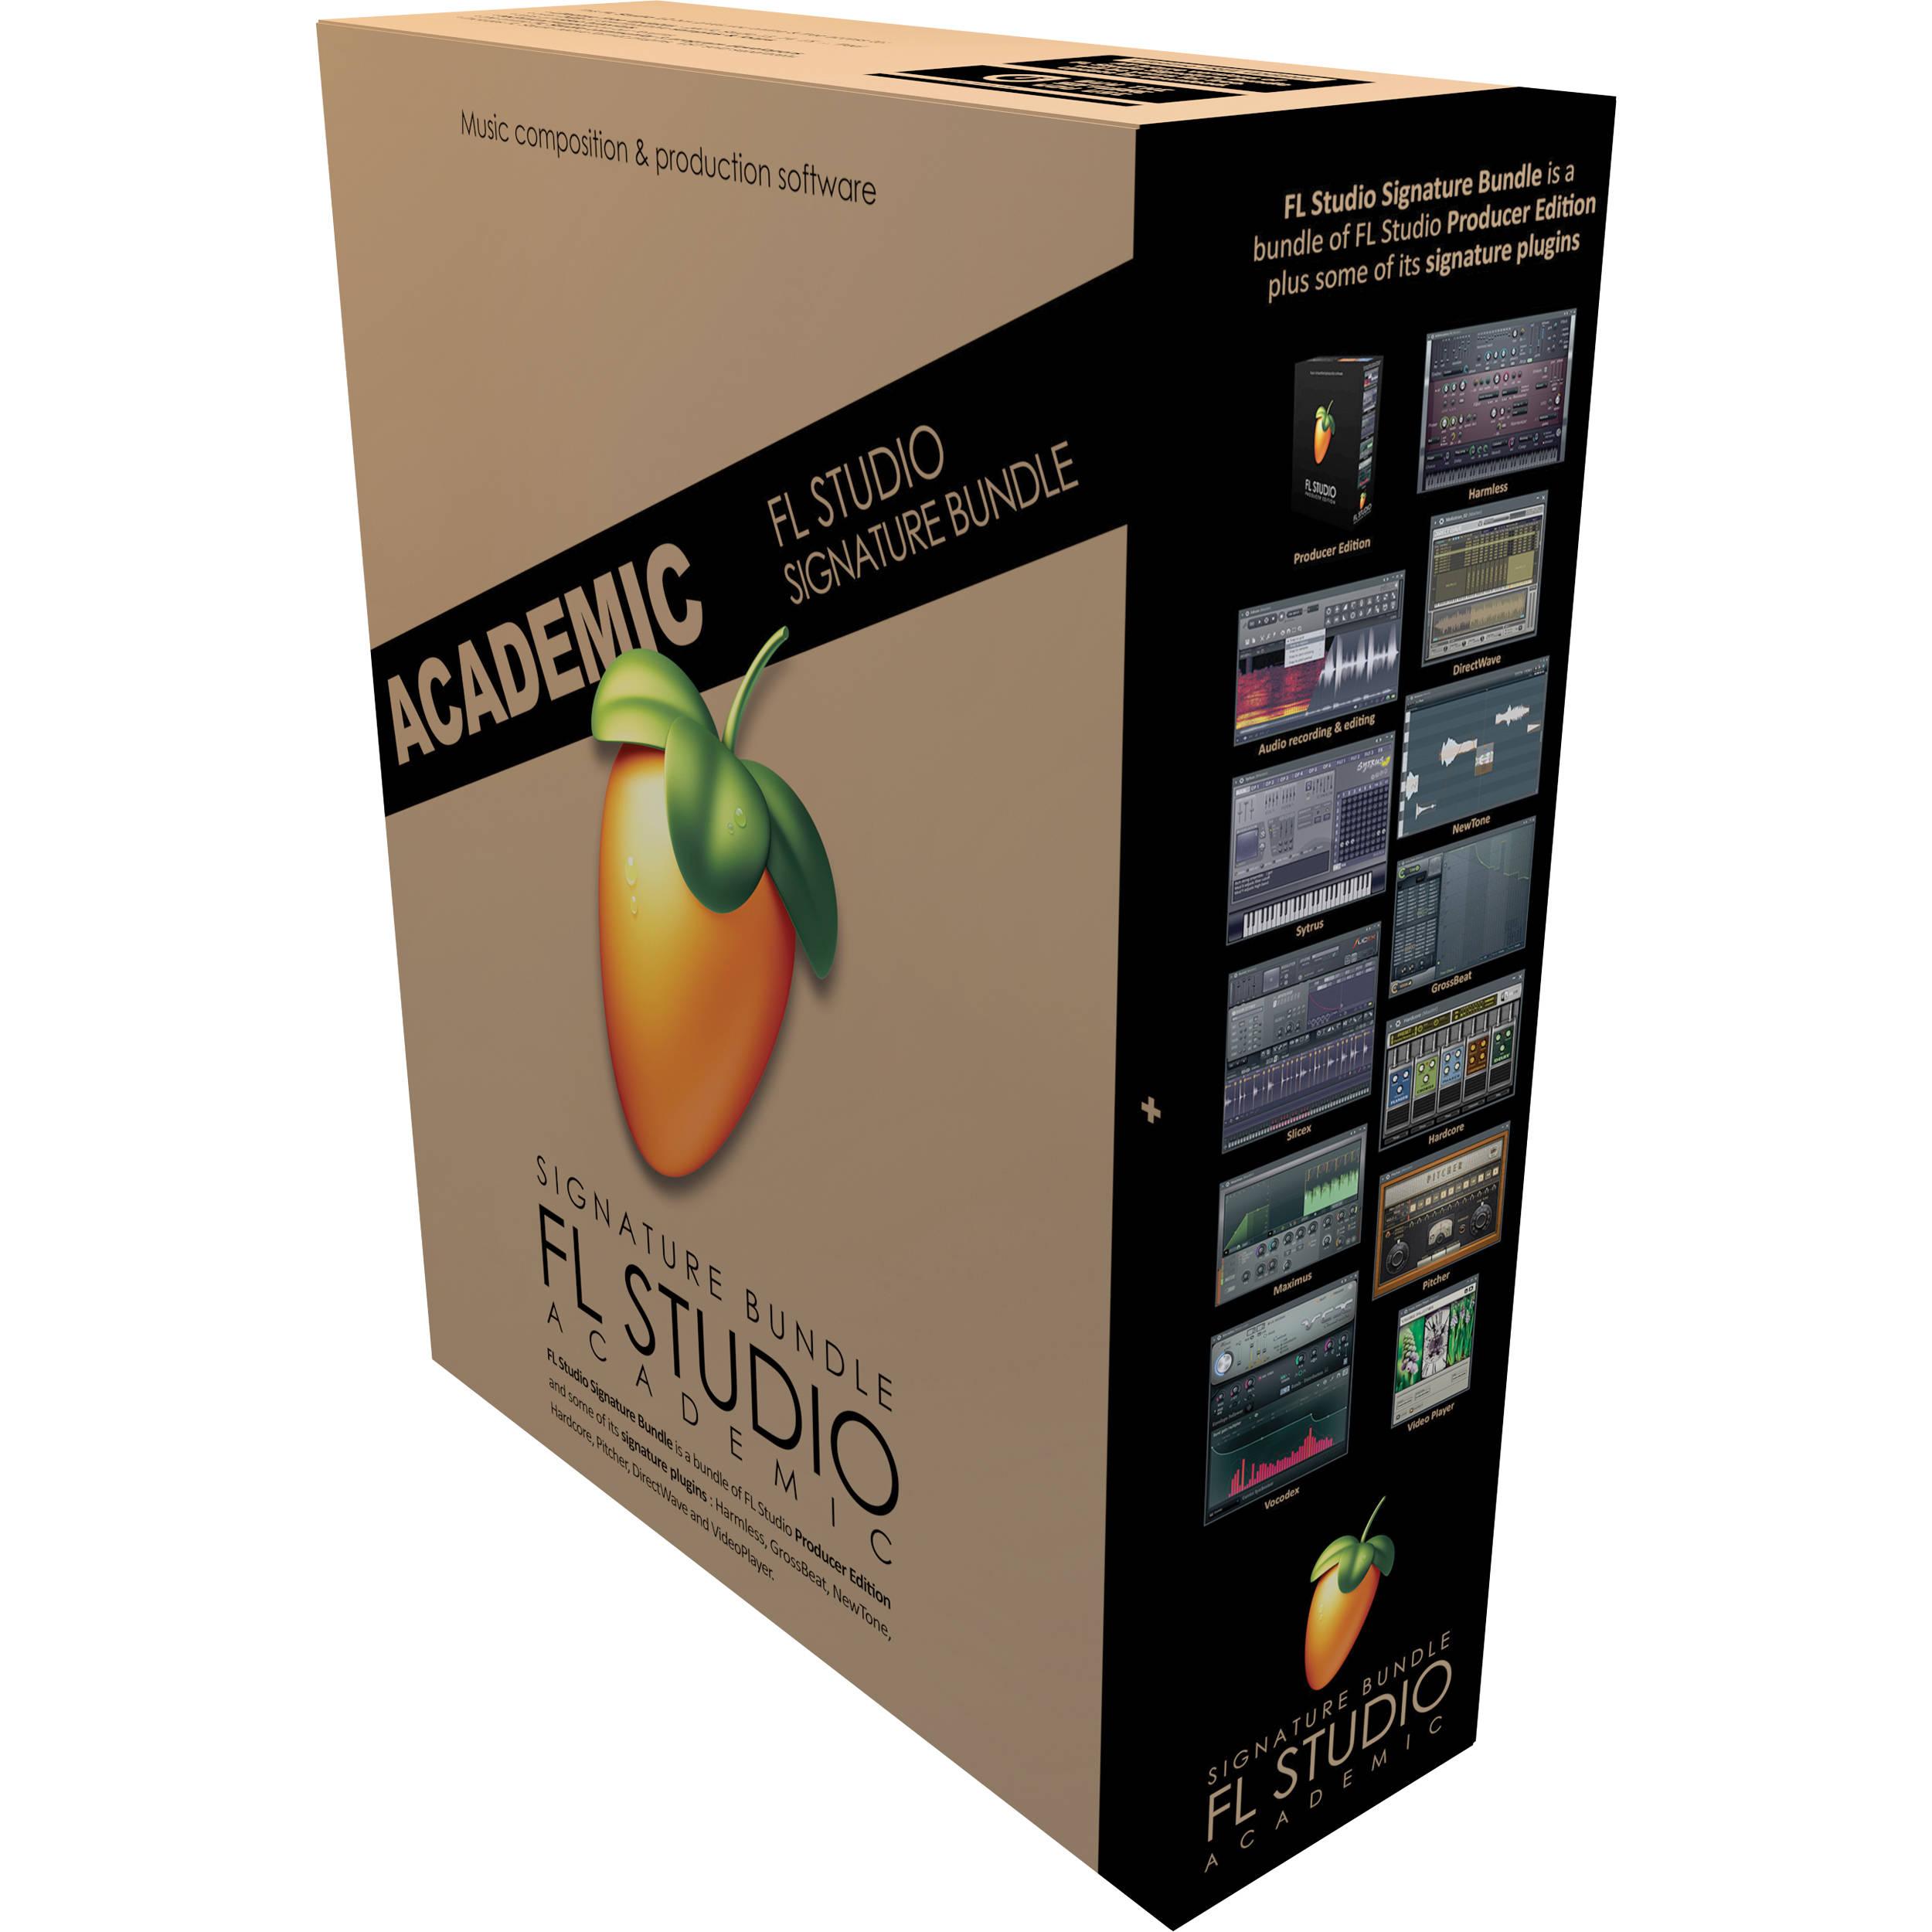 fl studio 12 all plugins bundle free download